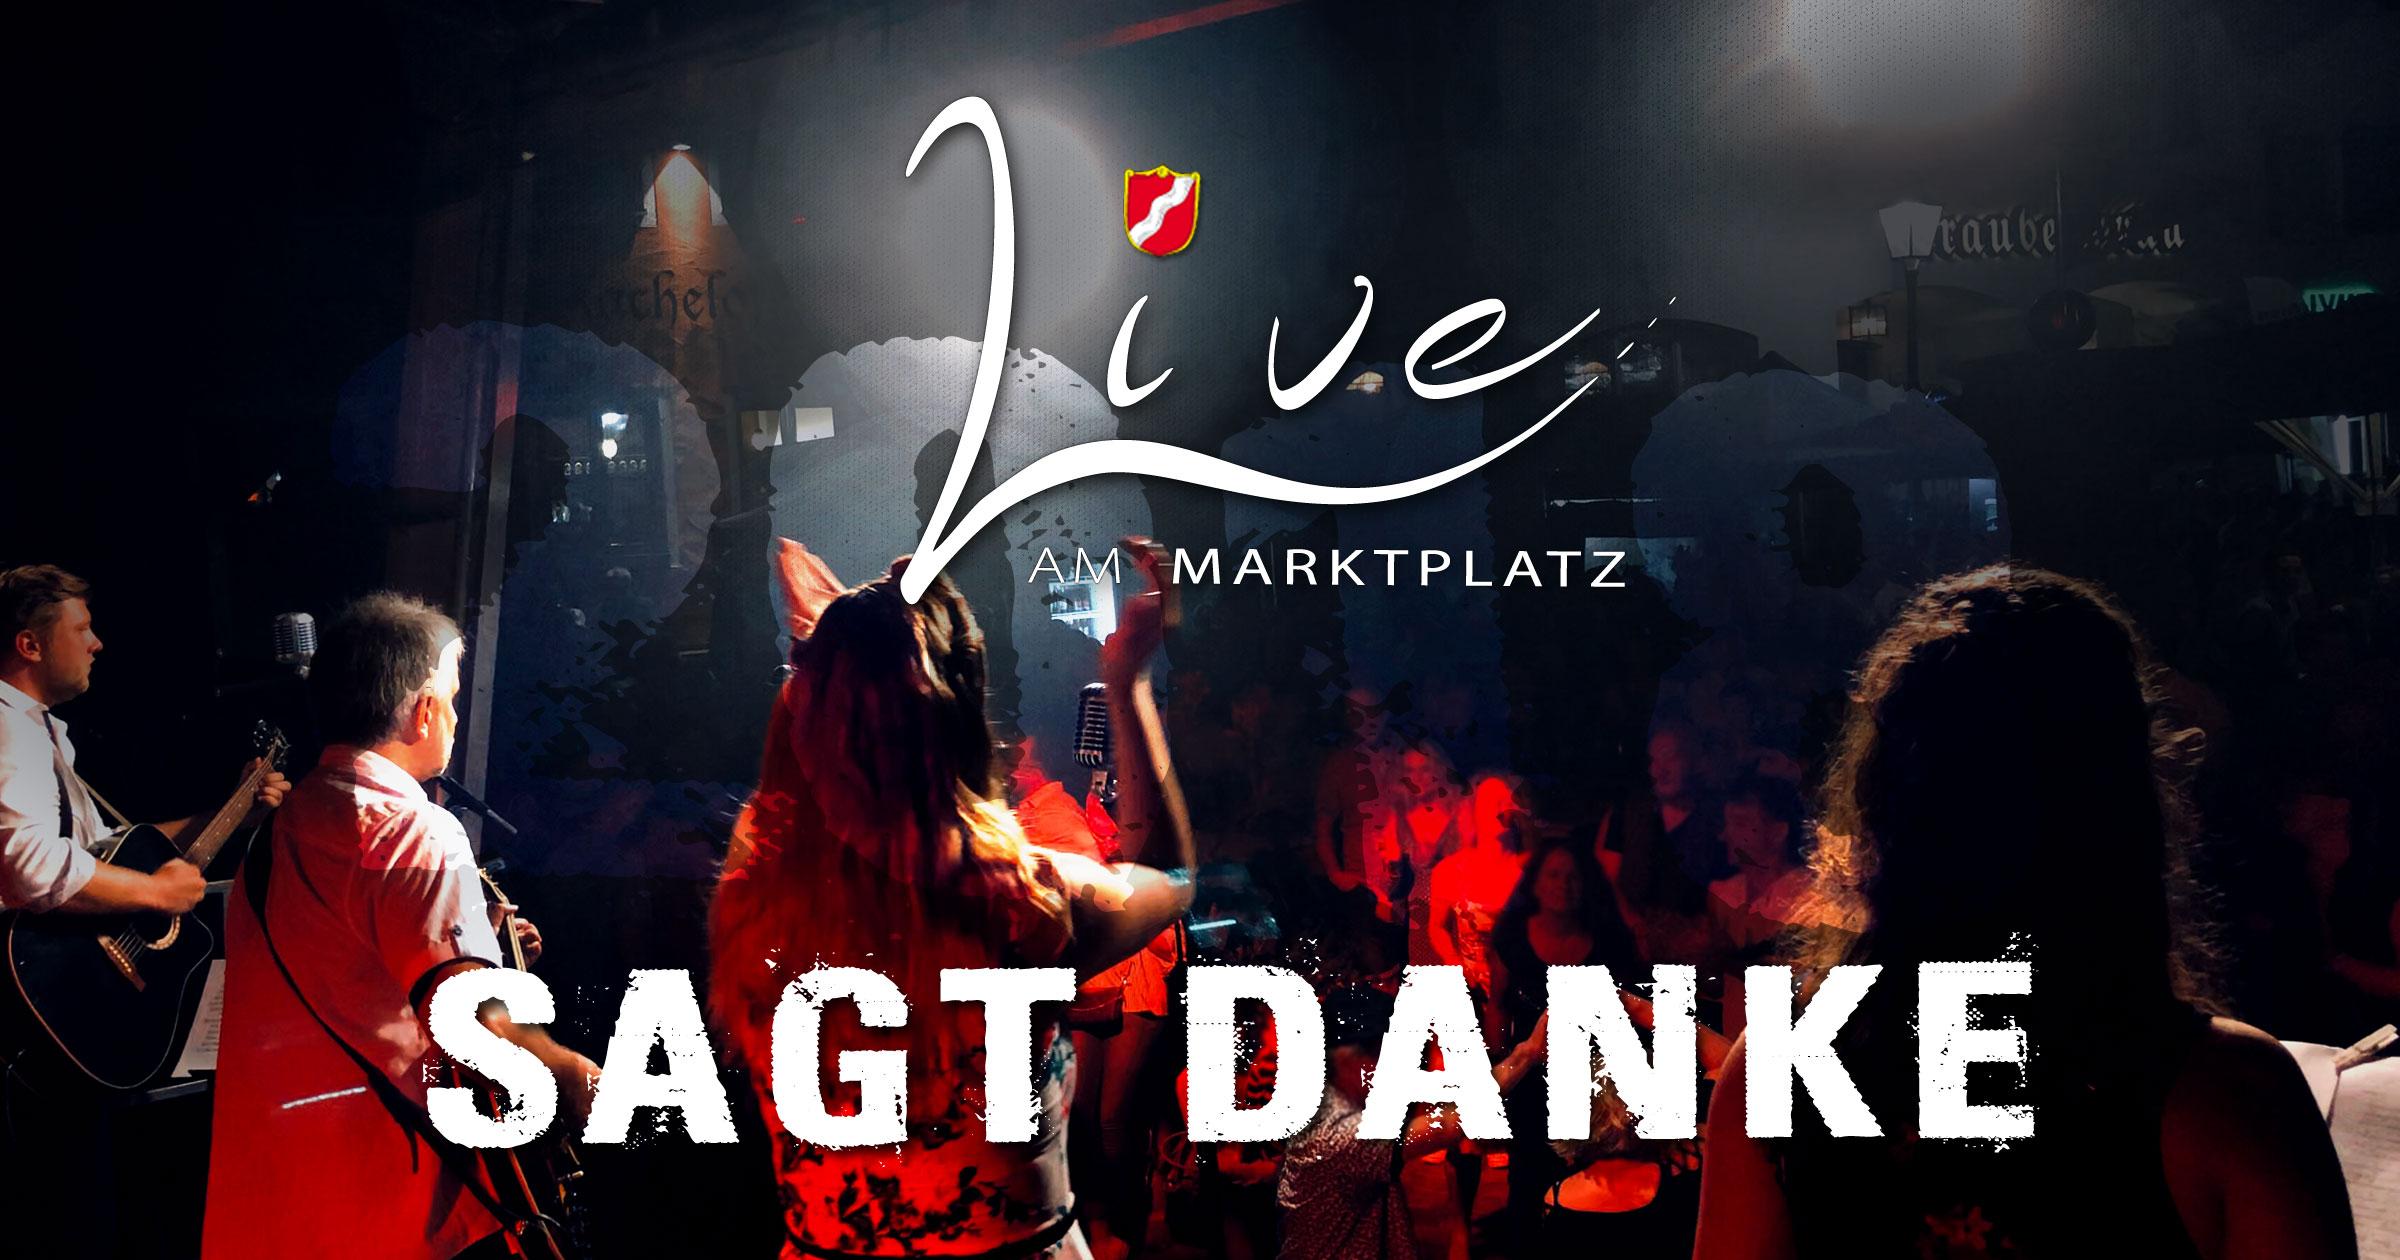 Live am Marktplatz 2018 sagt danke!